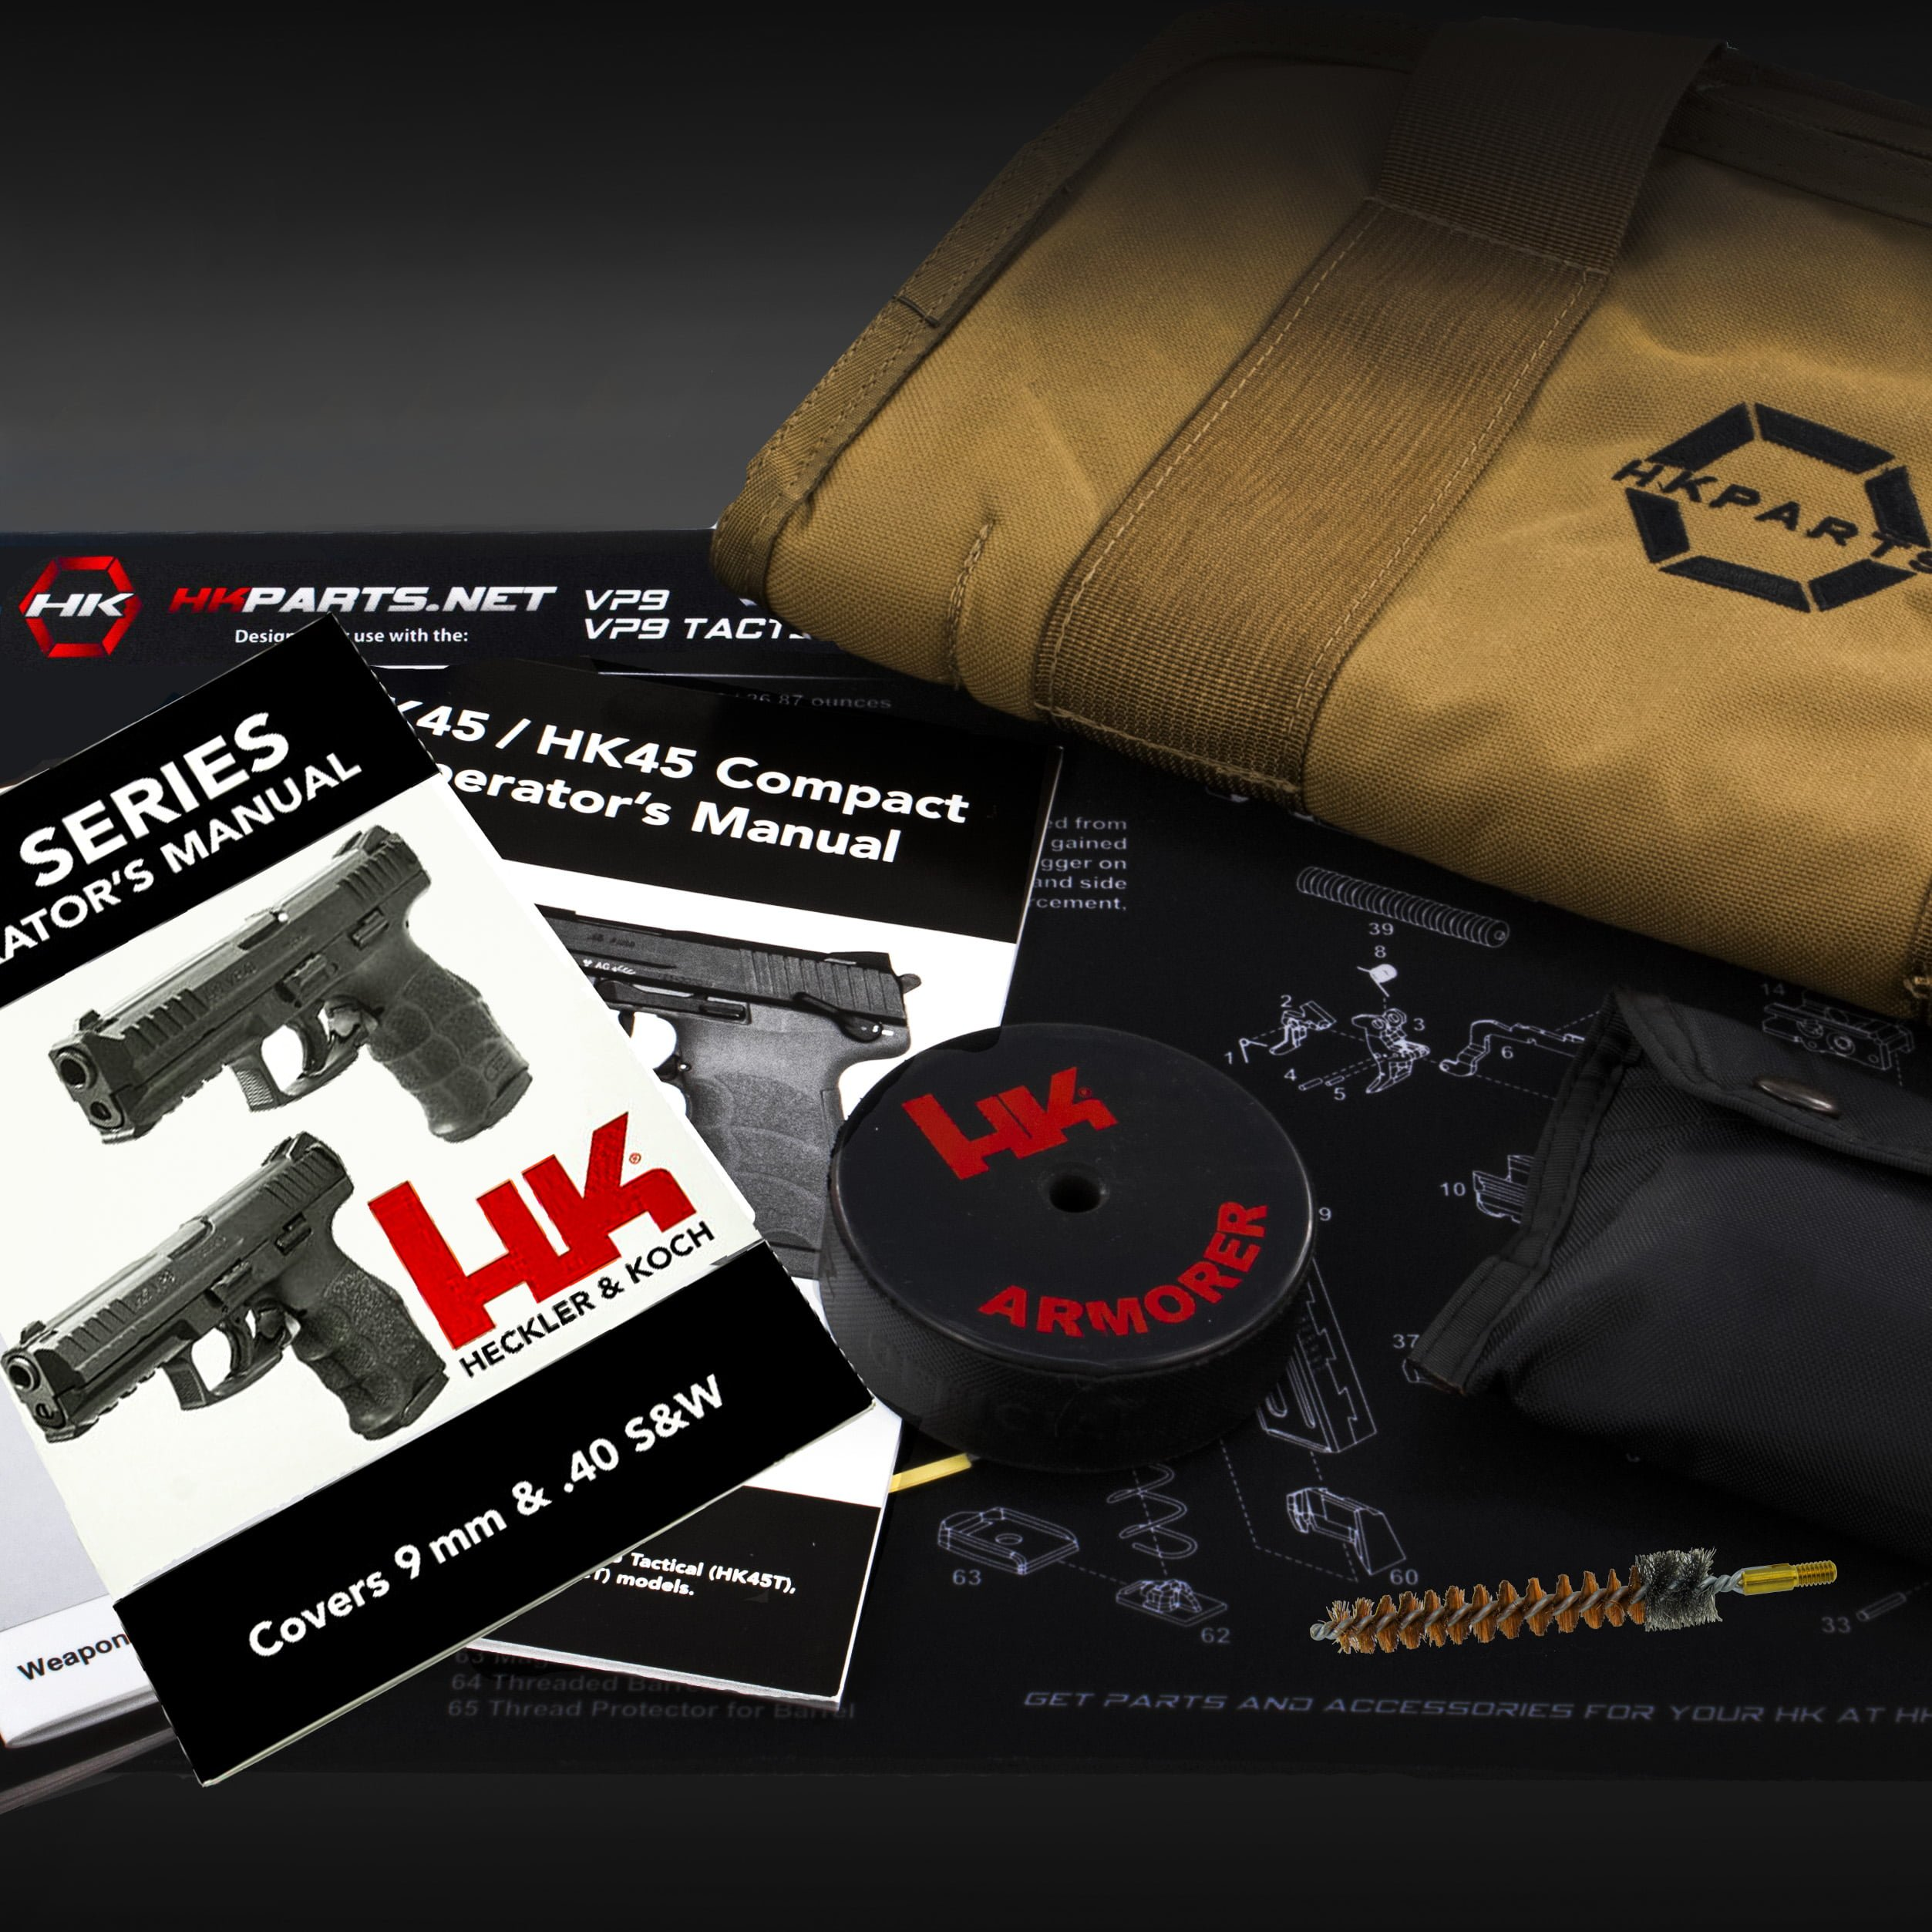 HK VP9 - Accessories